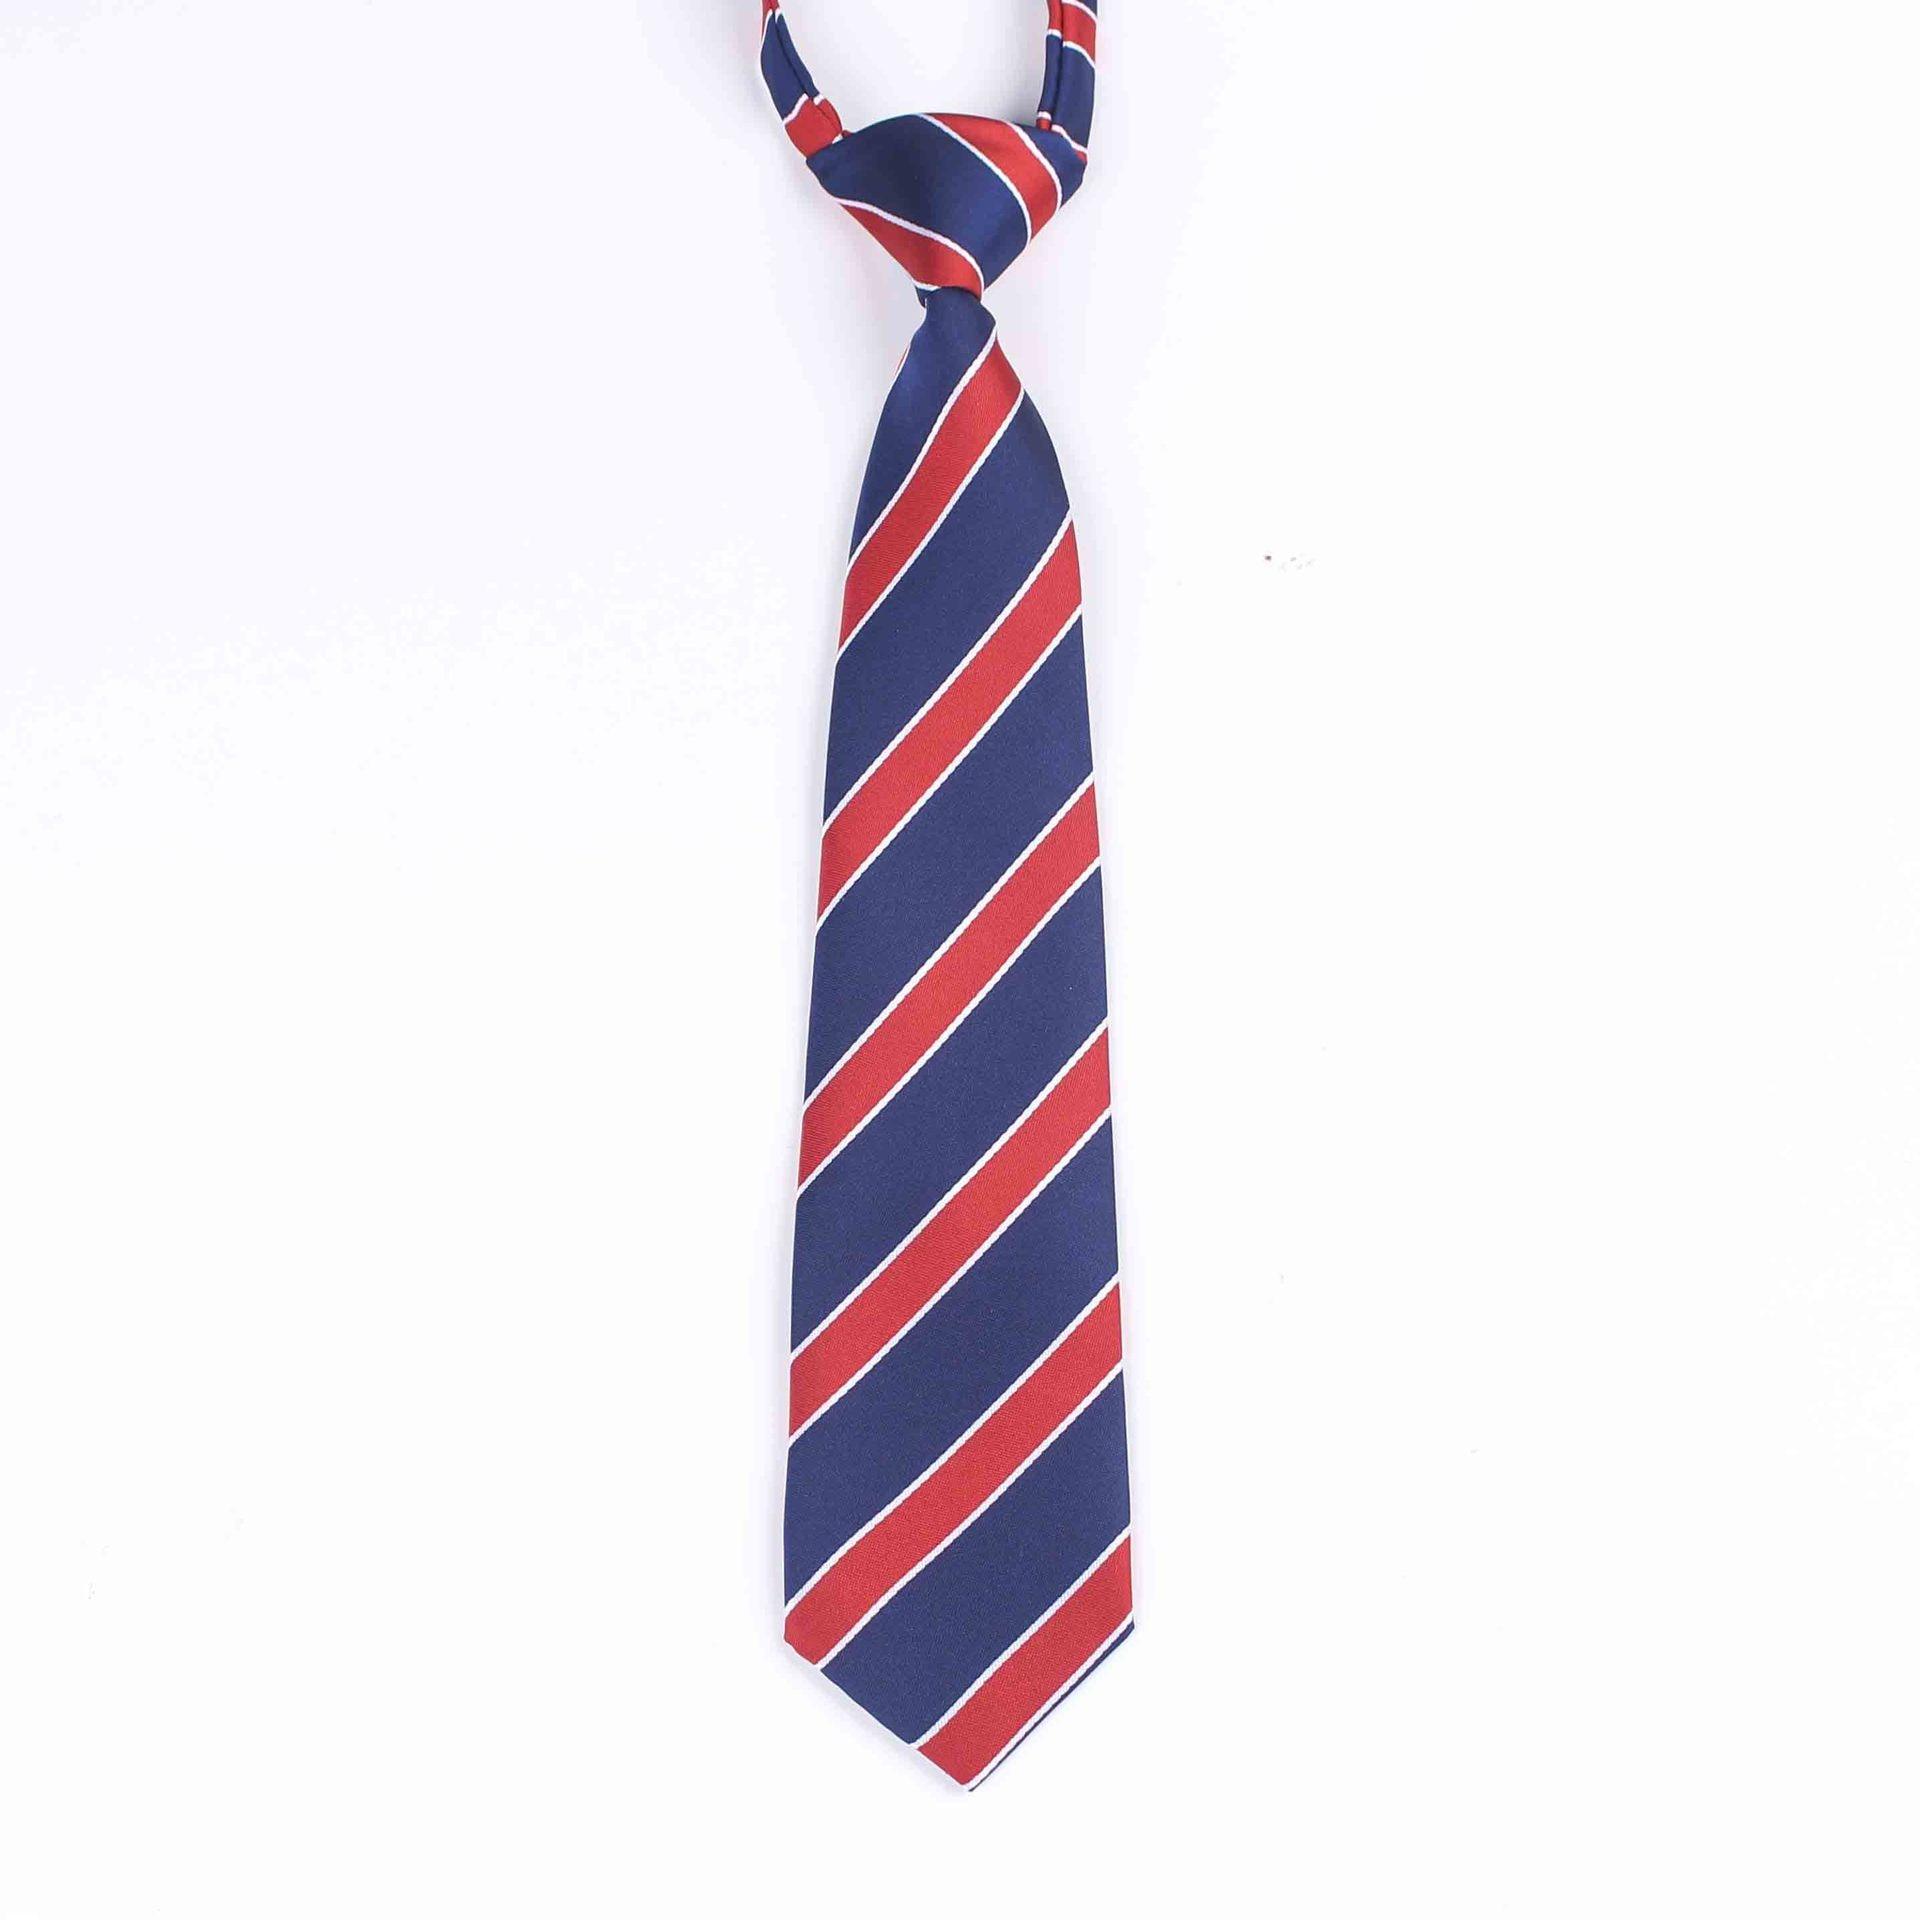 Mantieqingway Children Ties Casual Pink Neck Ties Skinny Cotton Necktie For Boys & Girls Solid Purple Tie Gravata Accessories